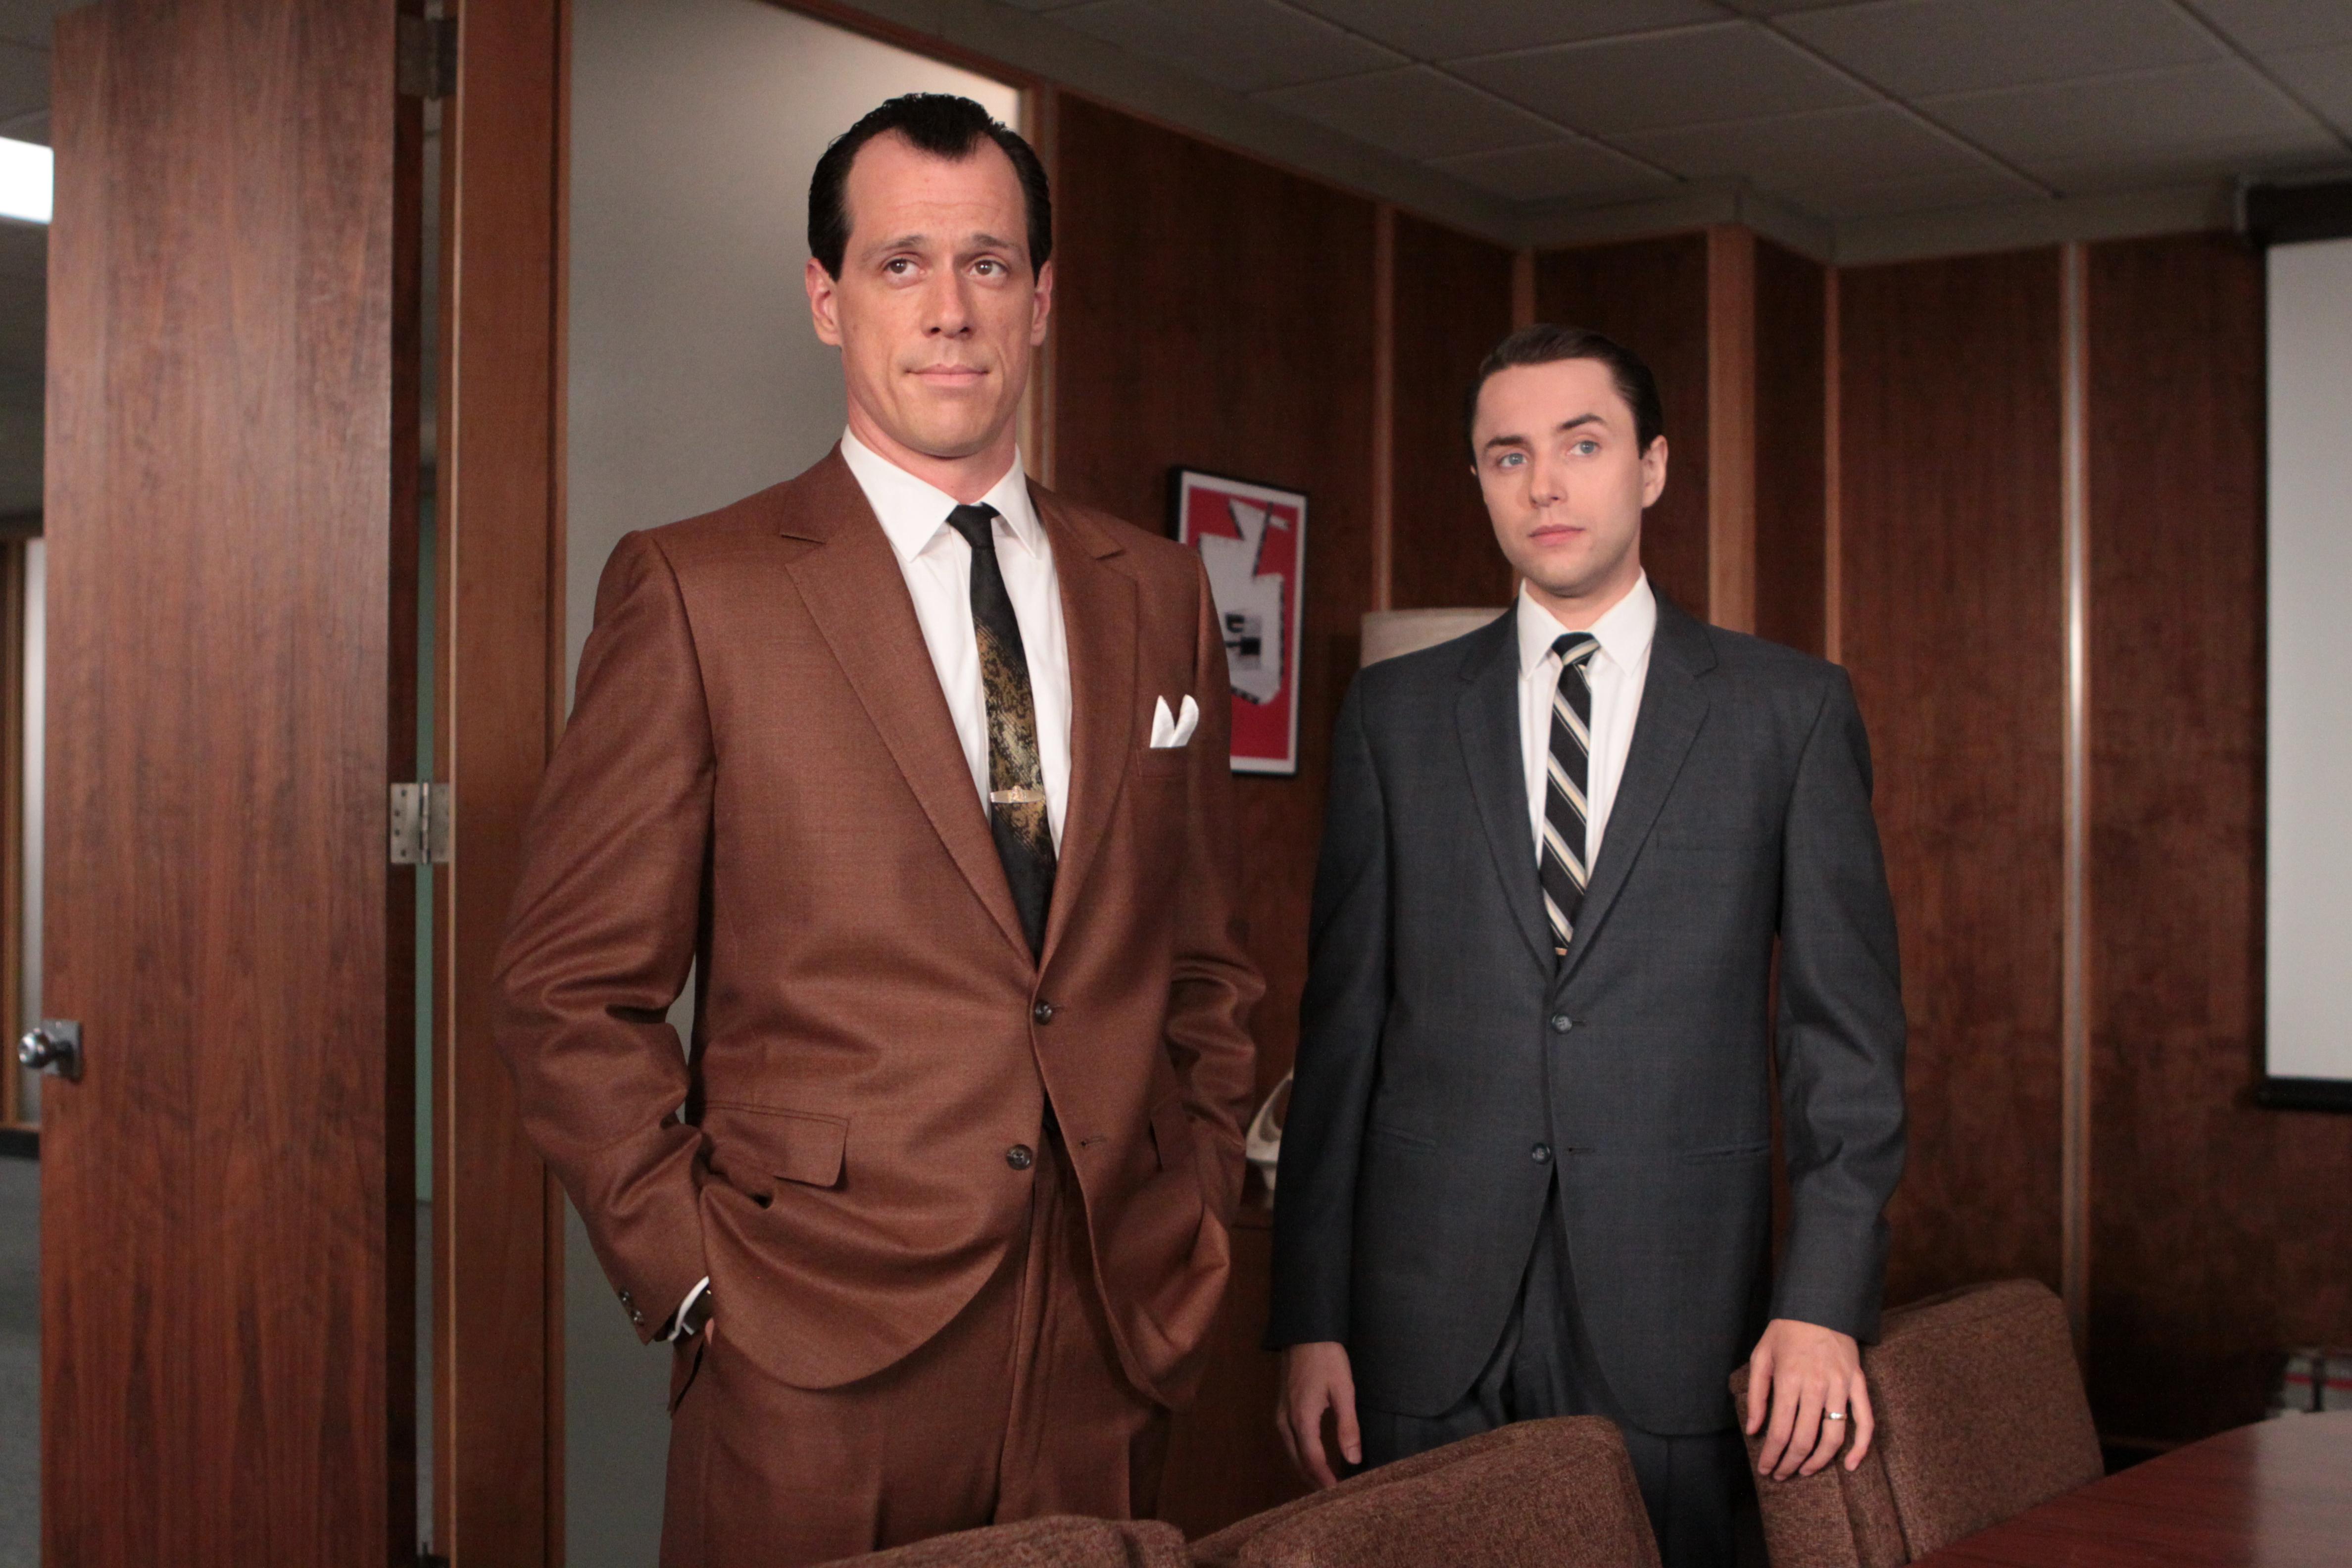 Lee Garner Jr. (Darren Pettie) and Pete Campbell (Vincent Kartheiser) in Mad Men